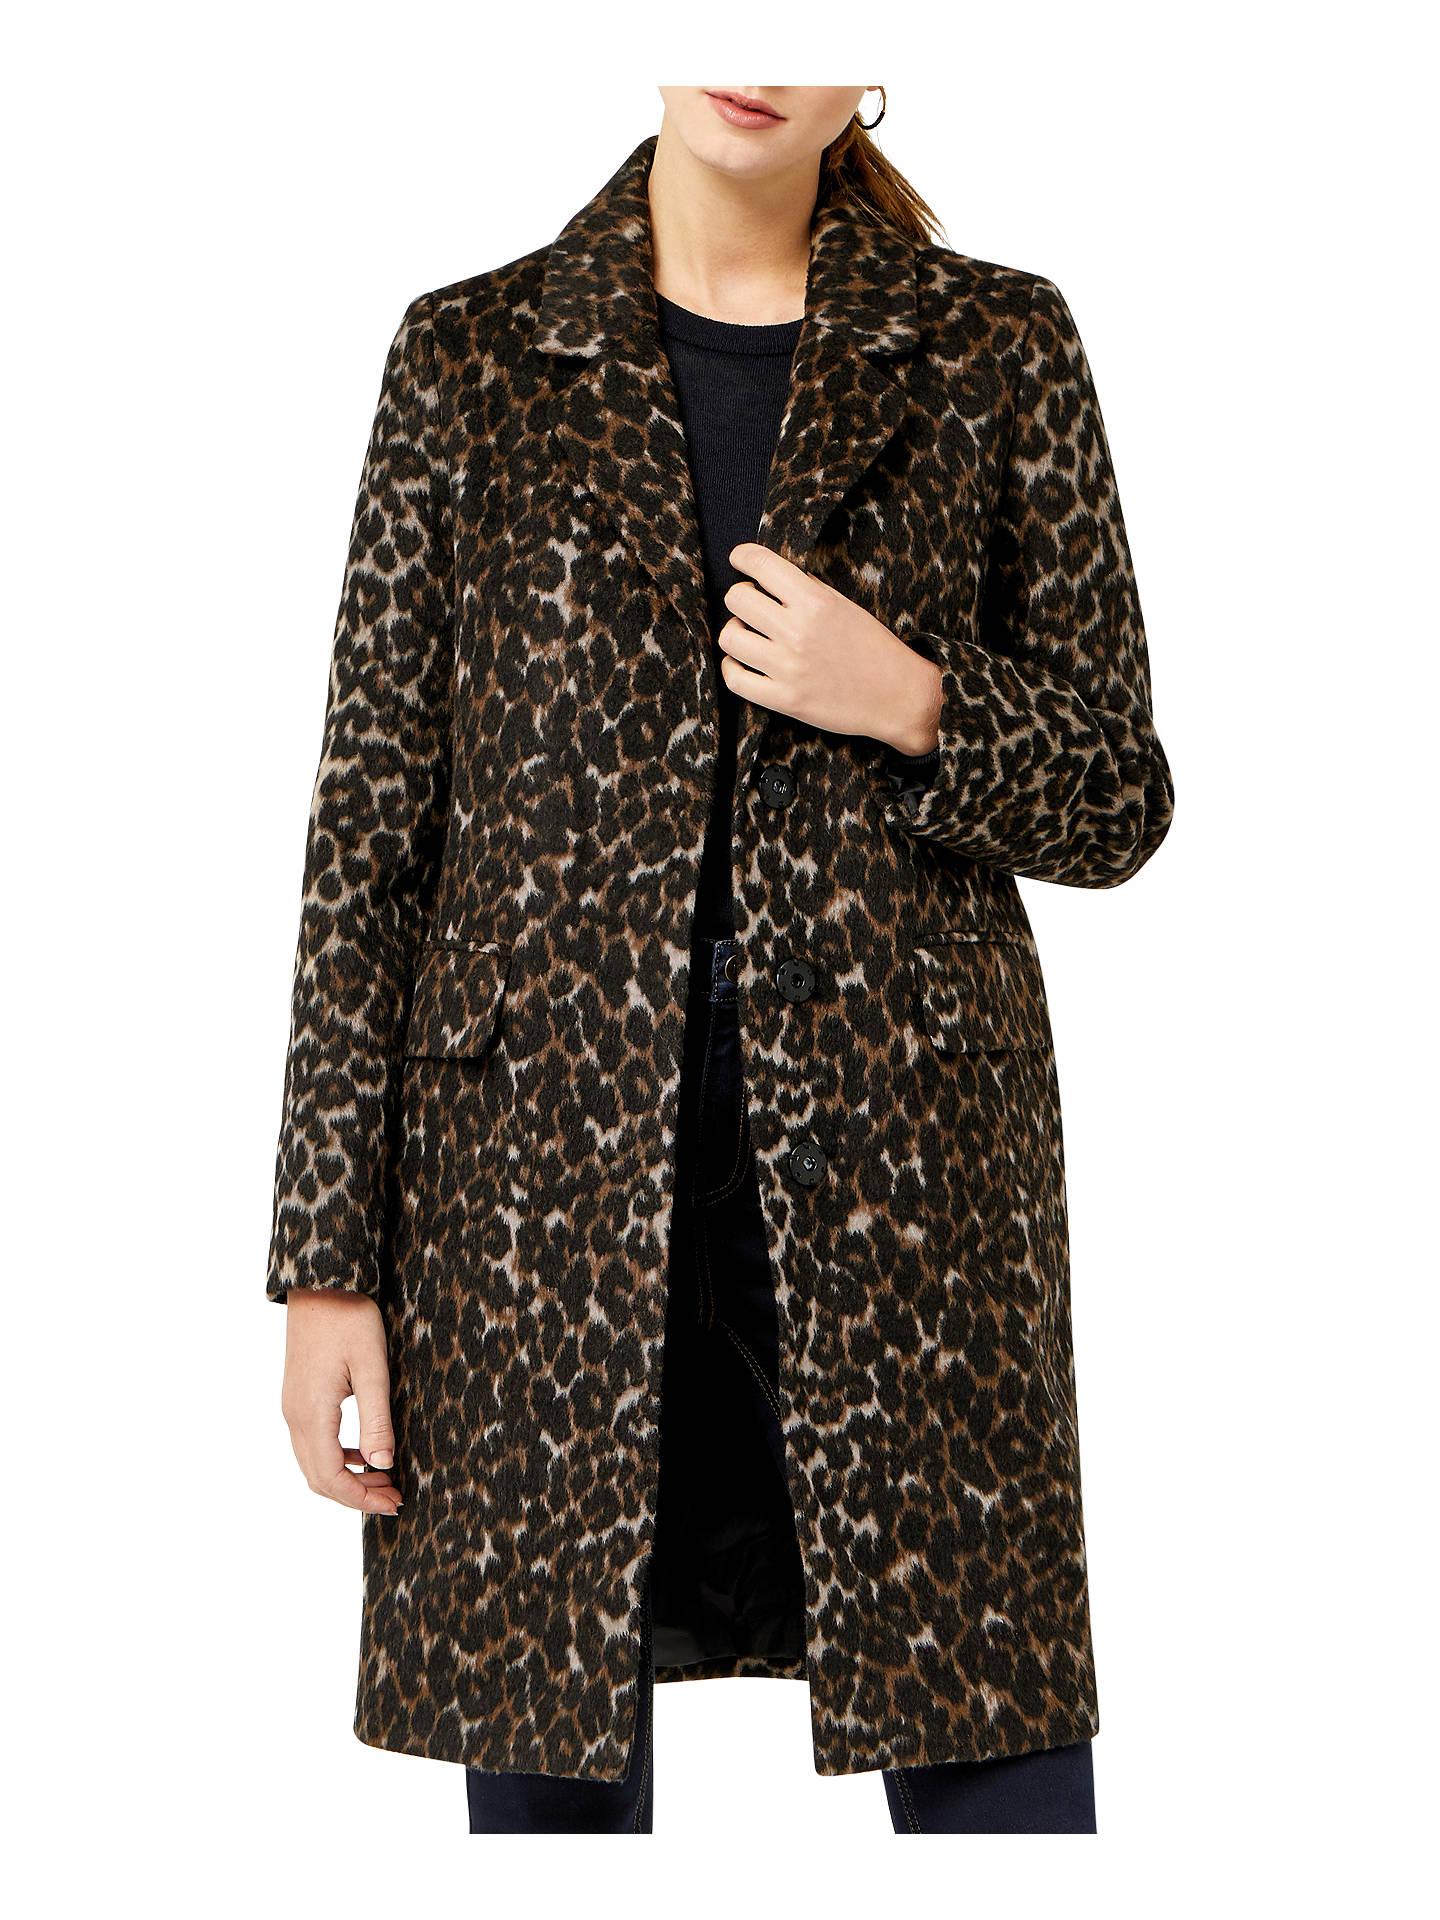 0478b0258d4e Buy Warehouse Animal Print Coat, Multi, 6 Online at johnlewis.com ...